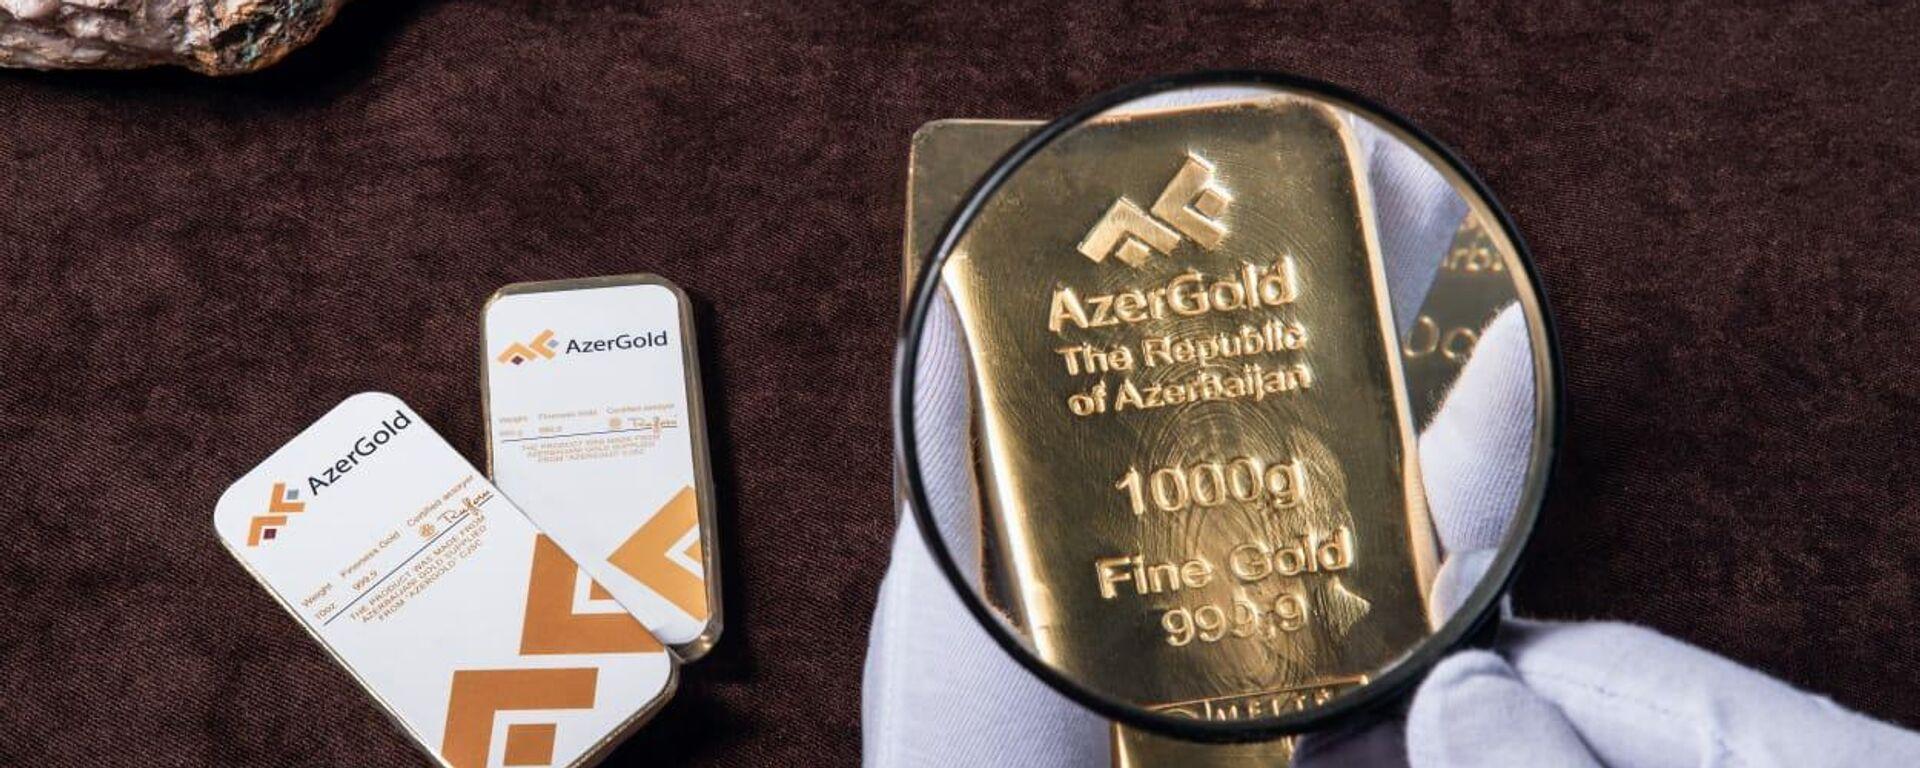 Центр продажи и обмена ЗАО AzerGold - Sputnik Азербайджан, 1920, 07.10.2021